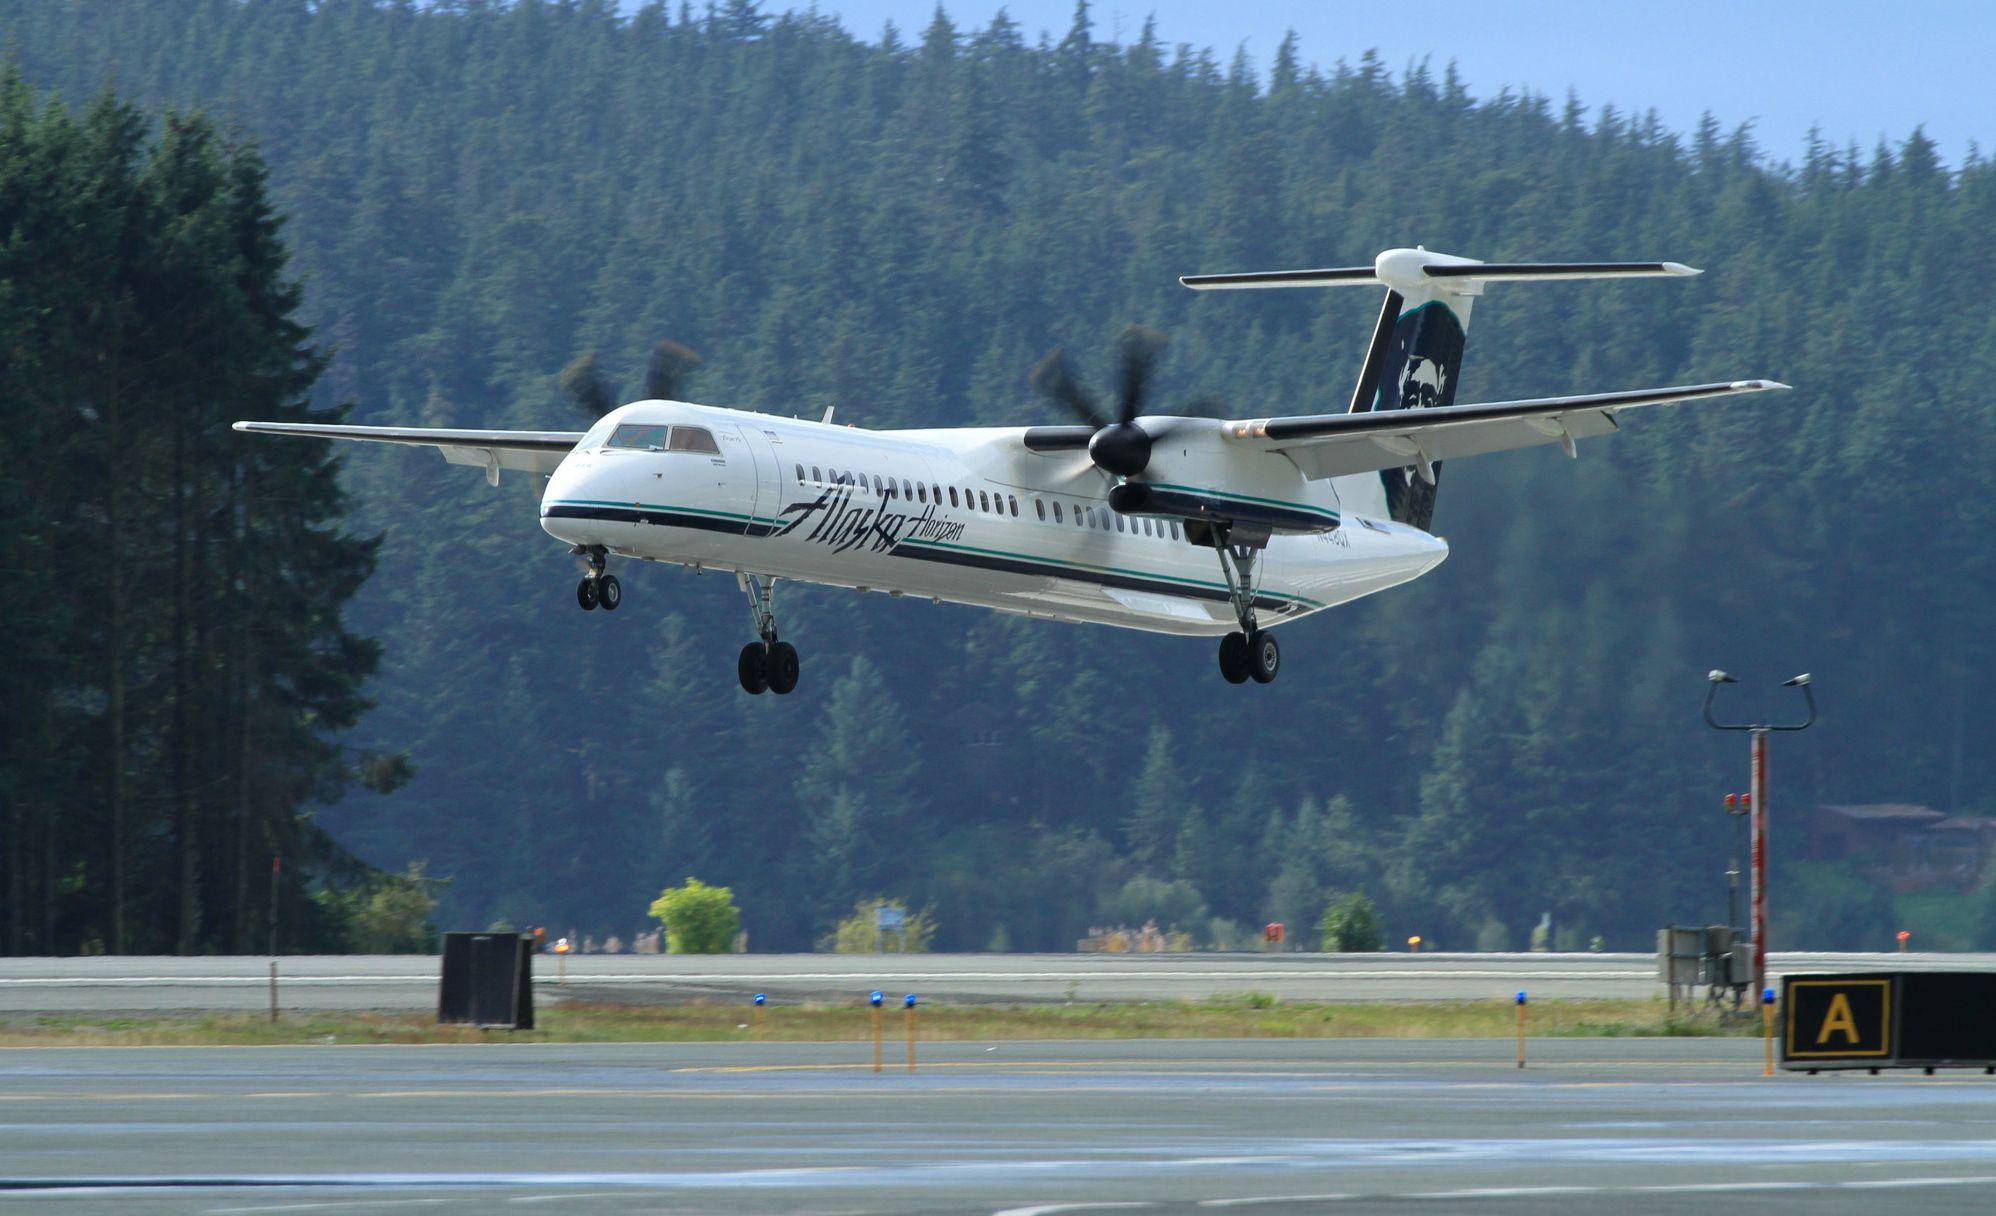 Avión de Alaska Airlines que se estrelló